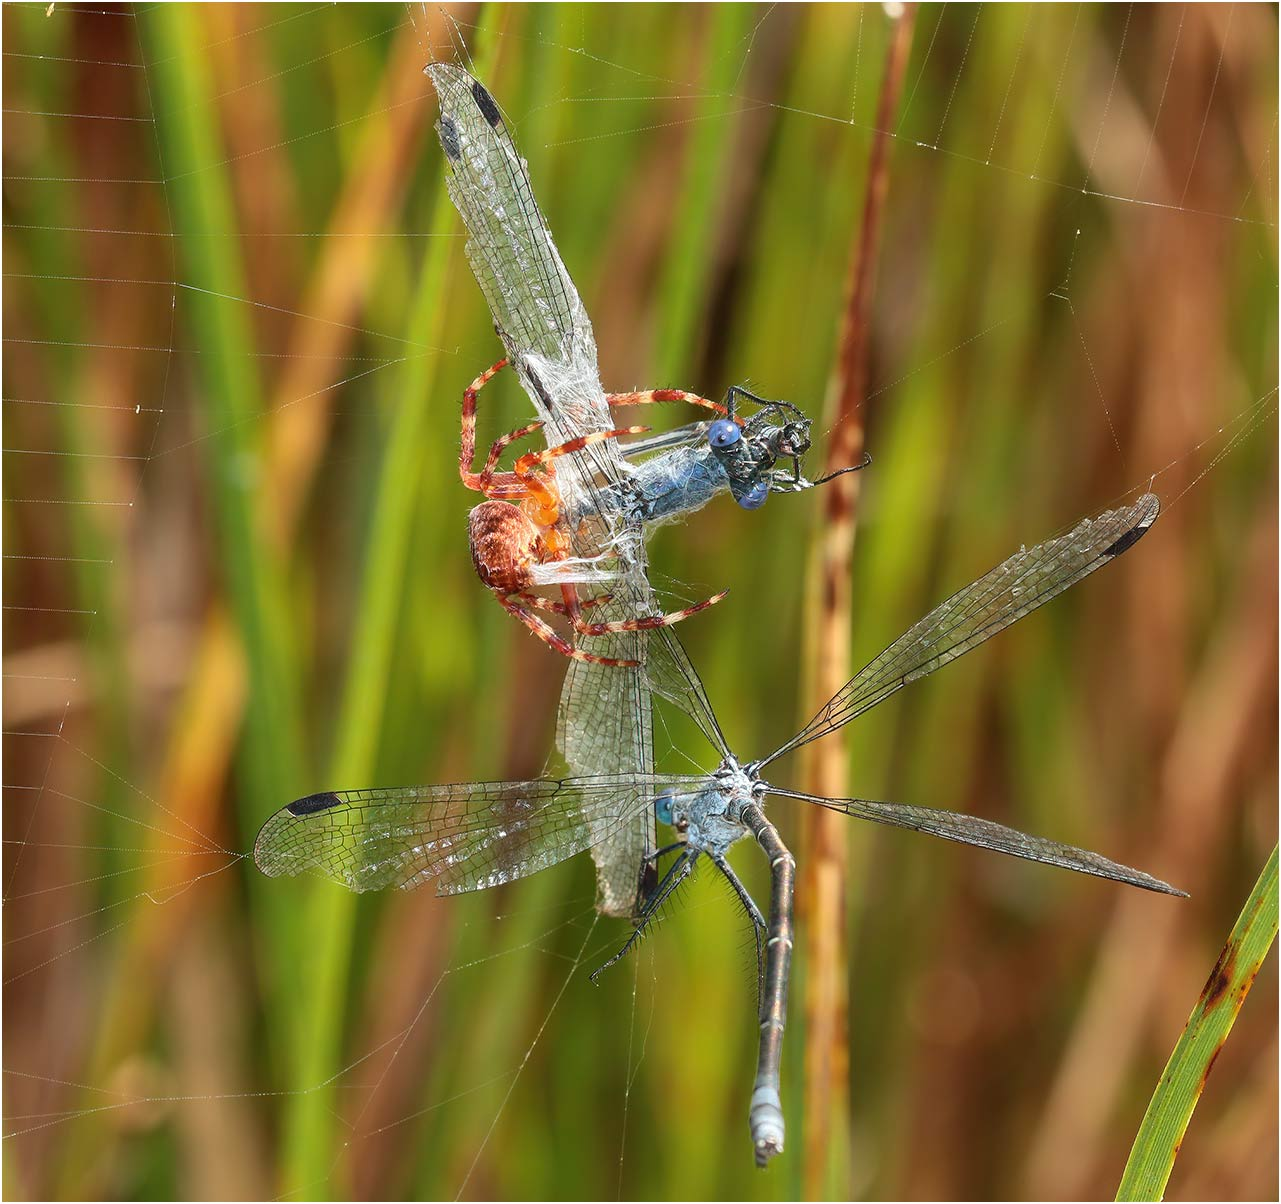 Lestes macrostigma mâle, prédation par Larinoides cornutus, La Barre de Monts, 12/07/2018